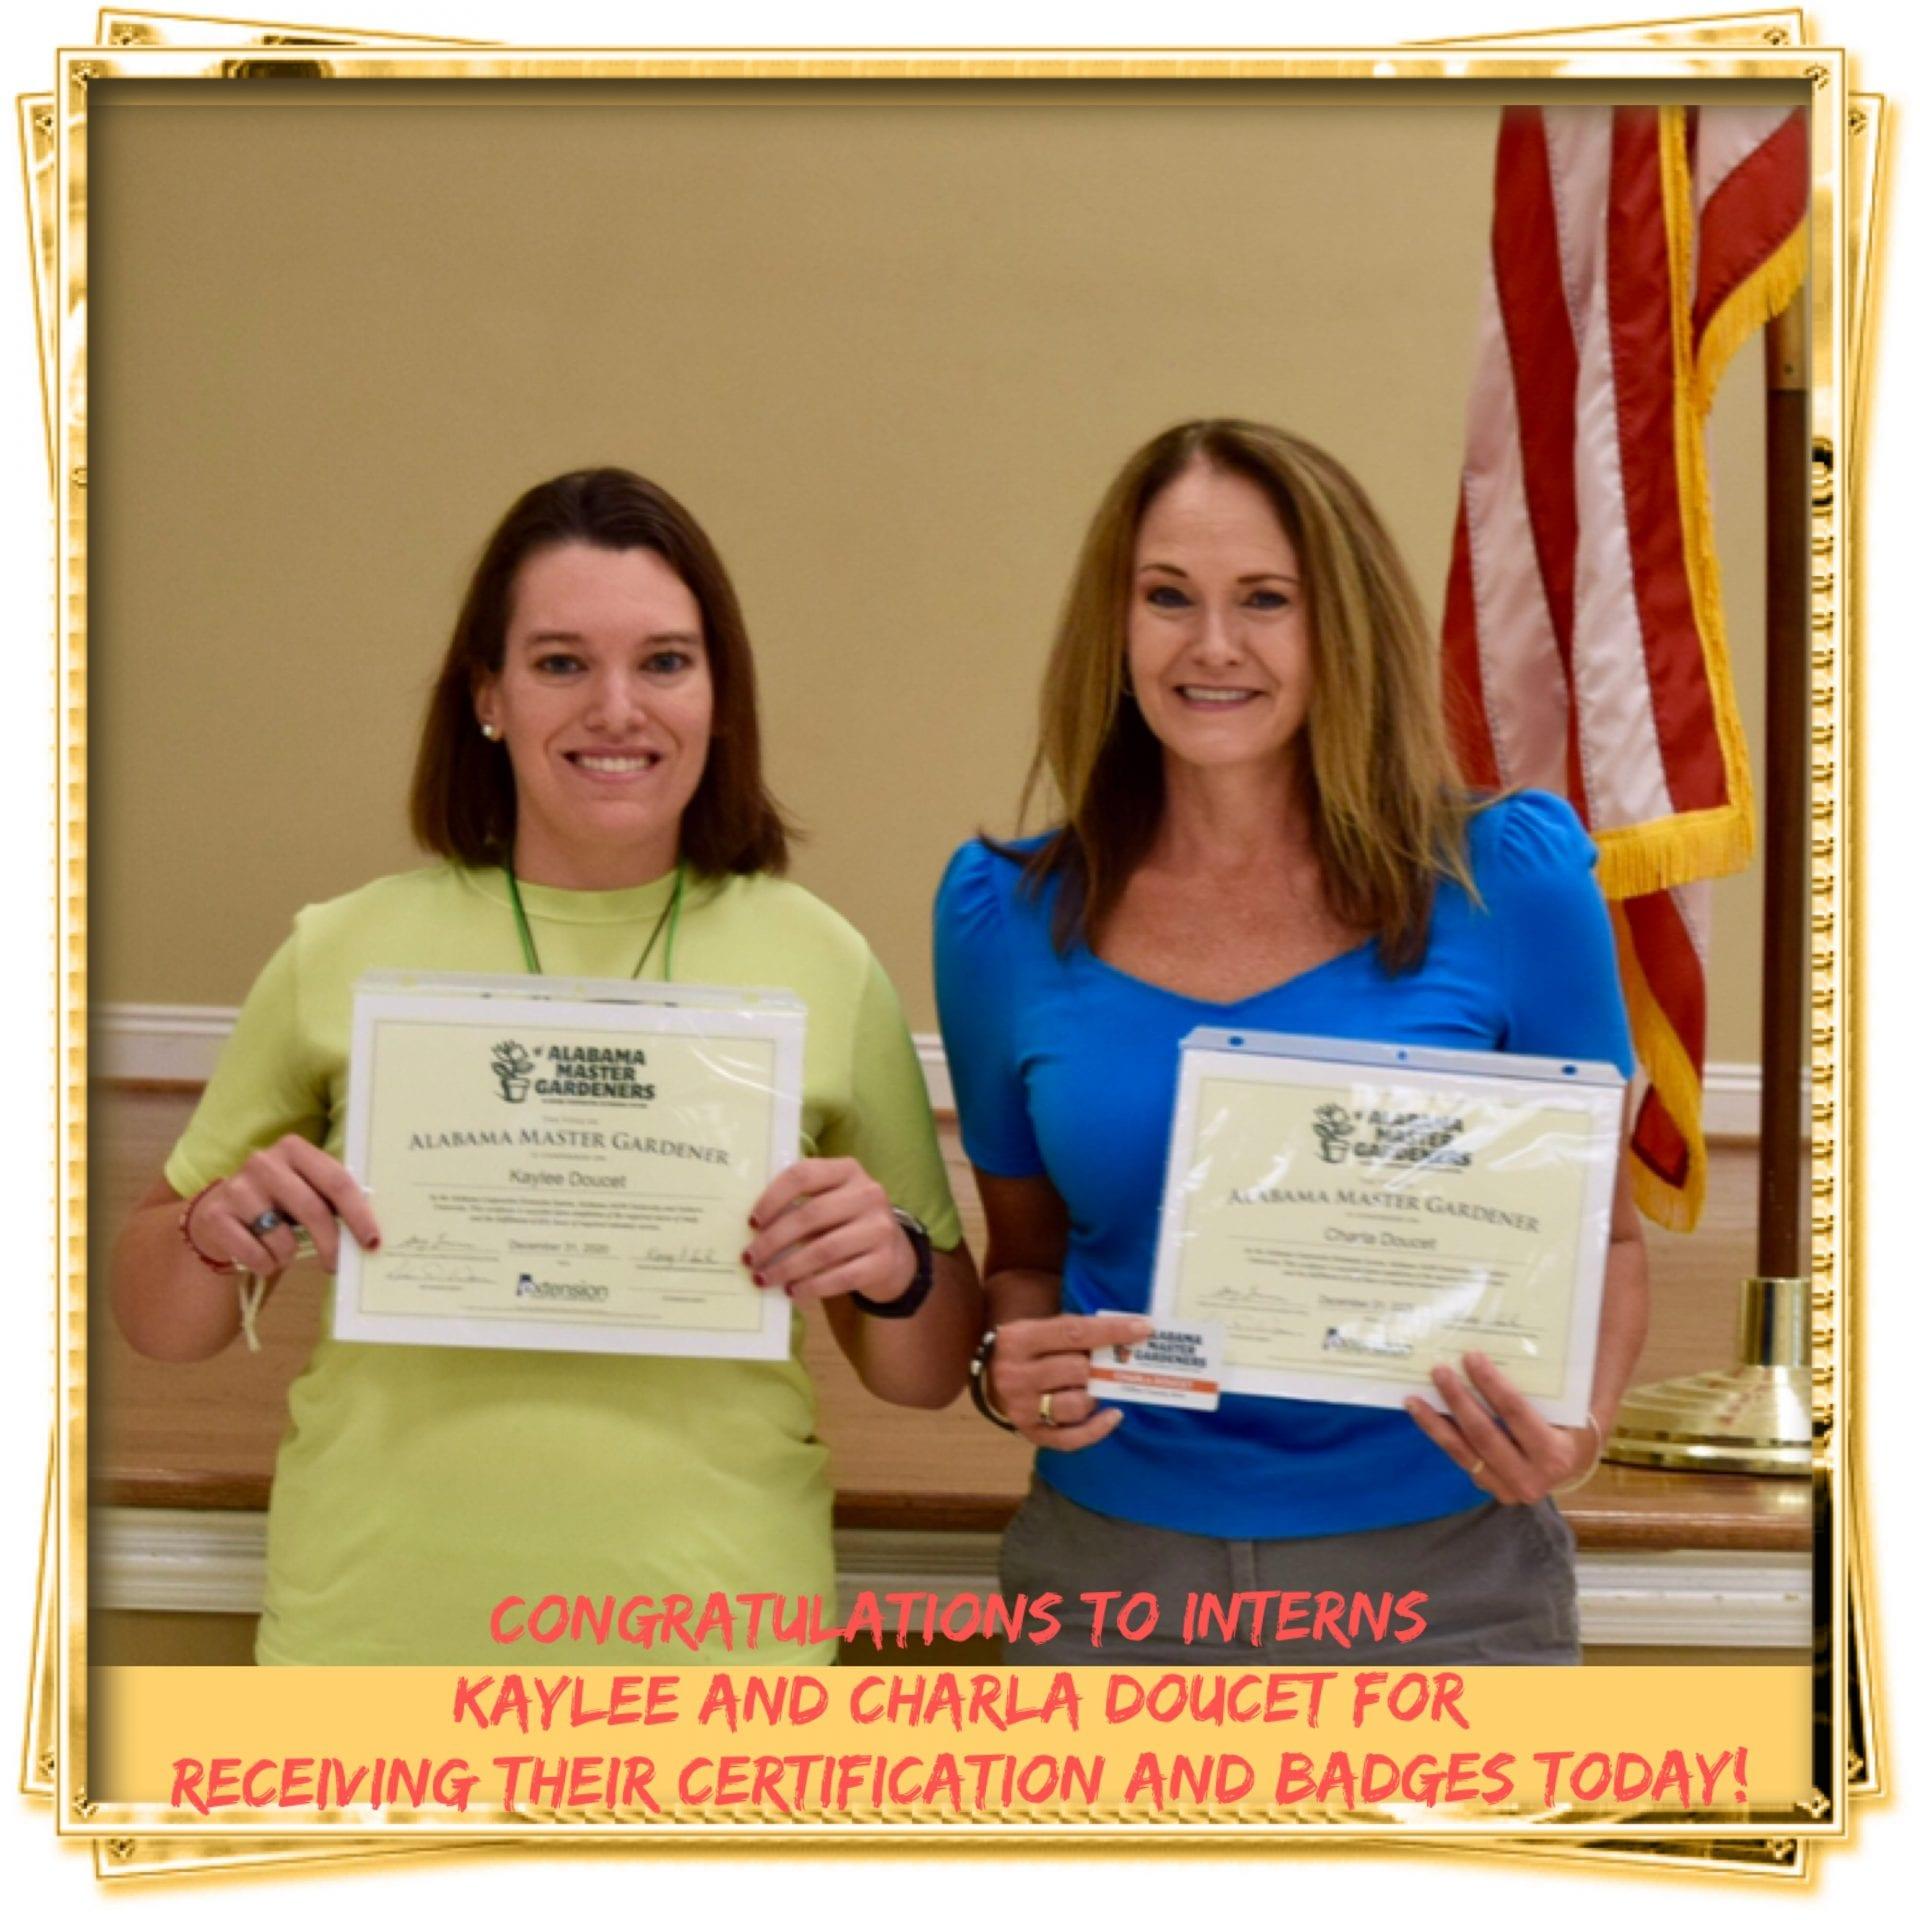 Master gardeners getting certificates